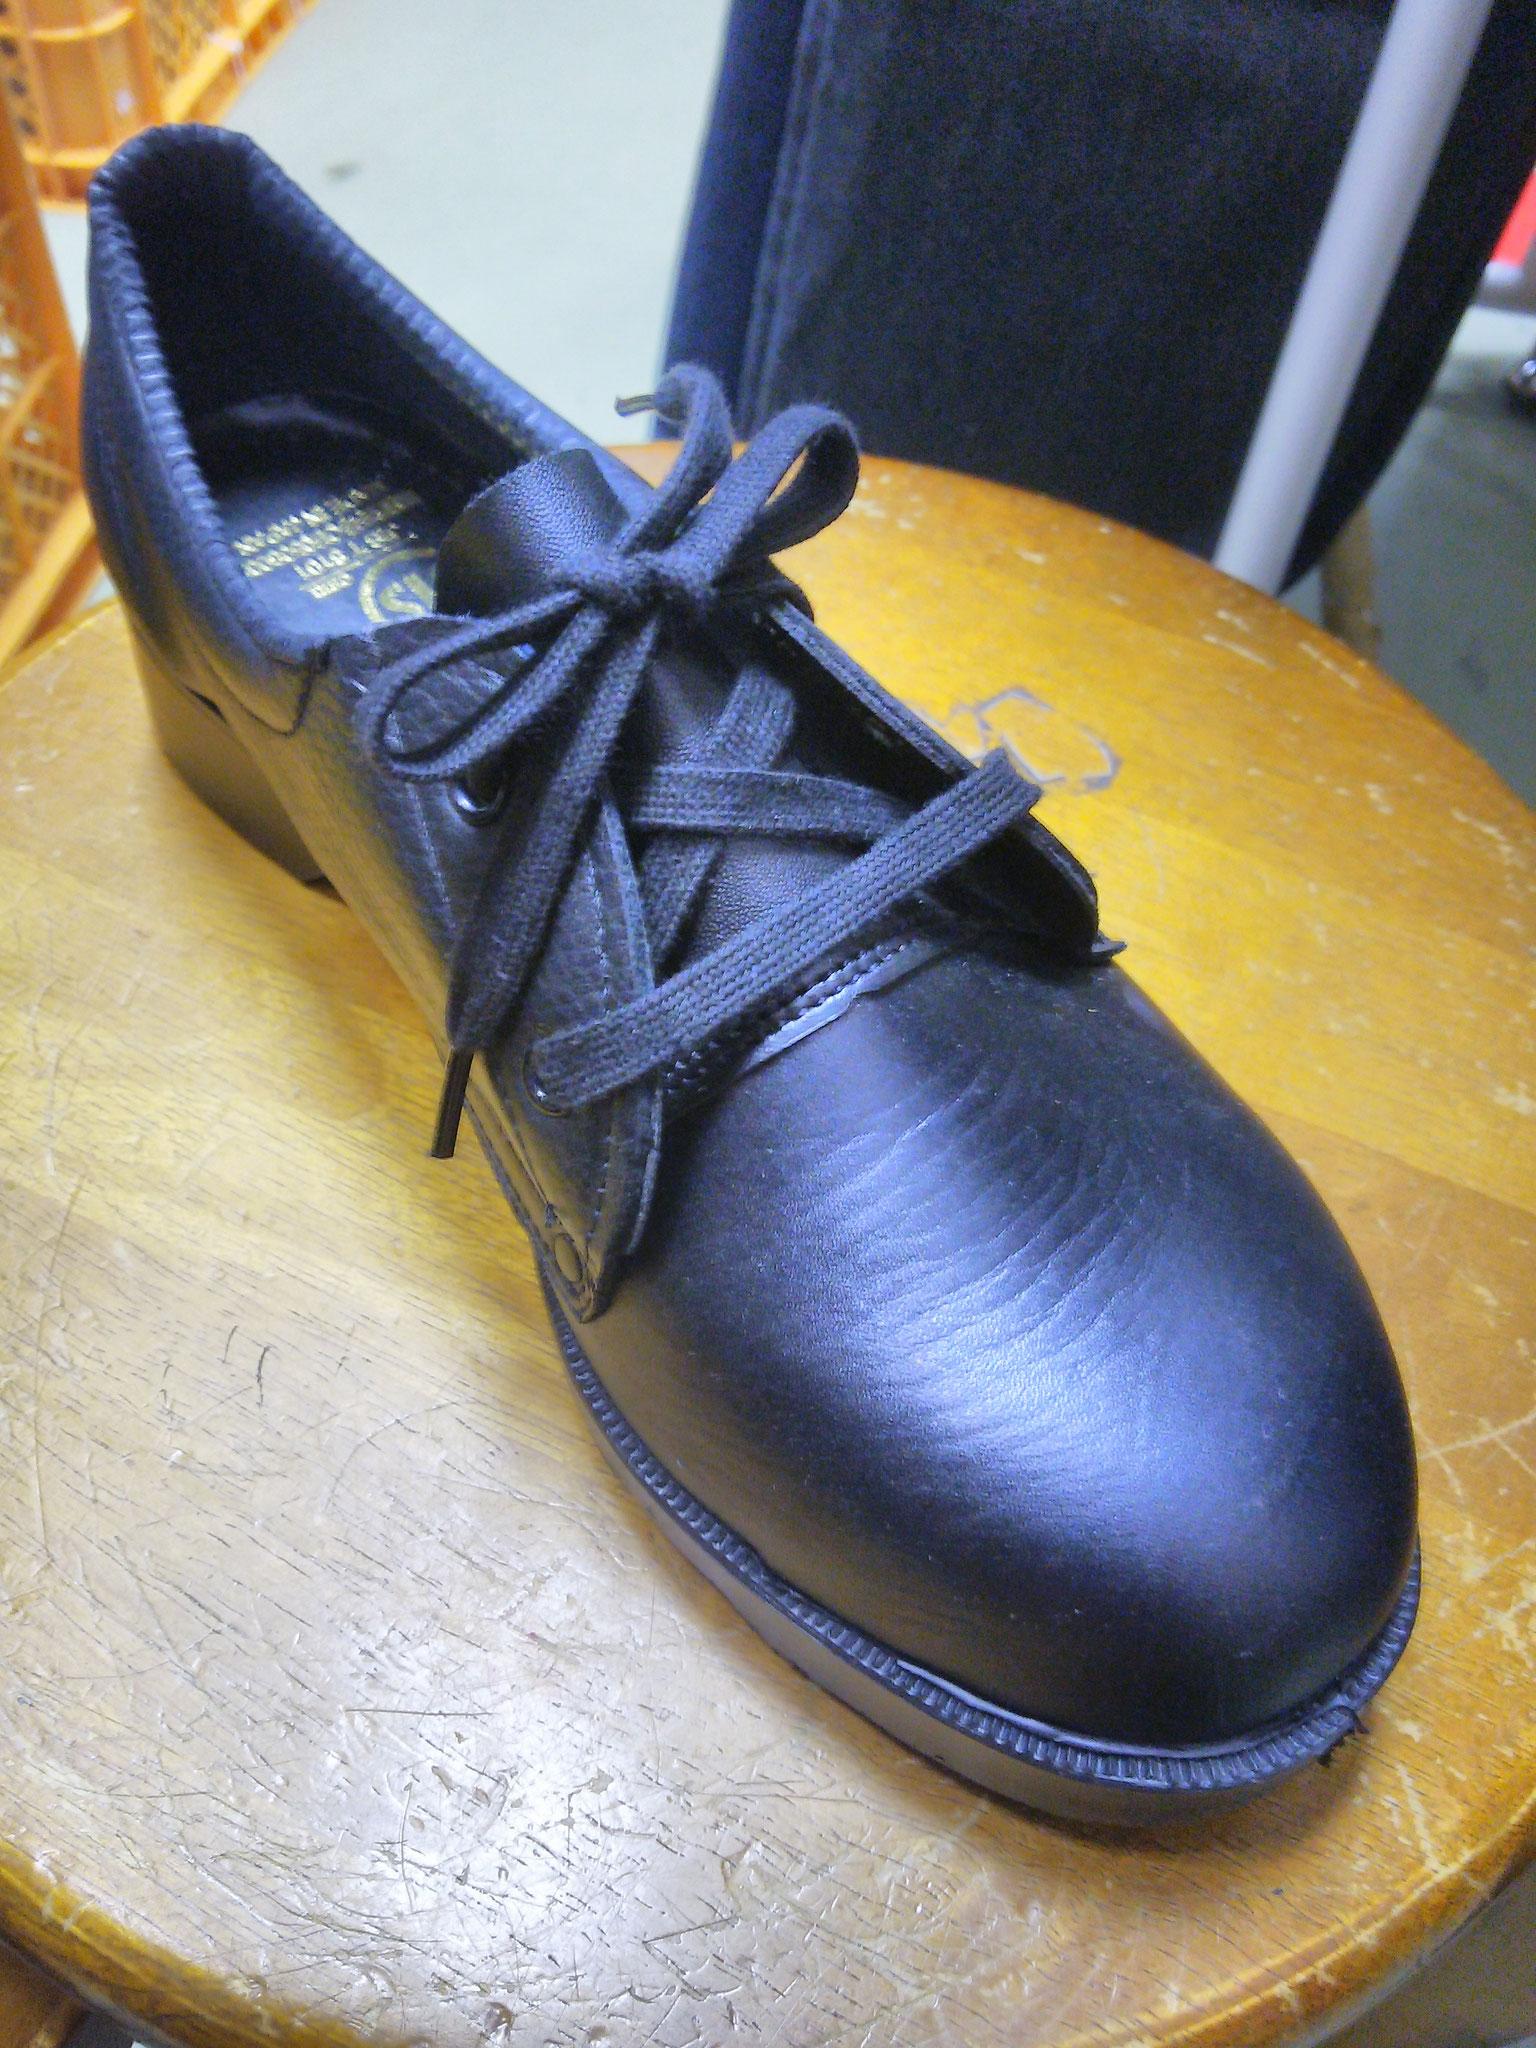 AN105V  革製安全靴  短靴  ¥3,990(税込)現場や扱い方にもよりますが、お手入れ次第で半年ぐらい持ちます。